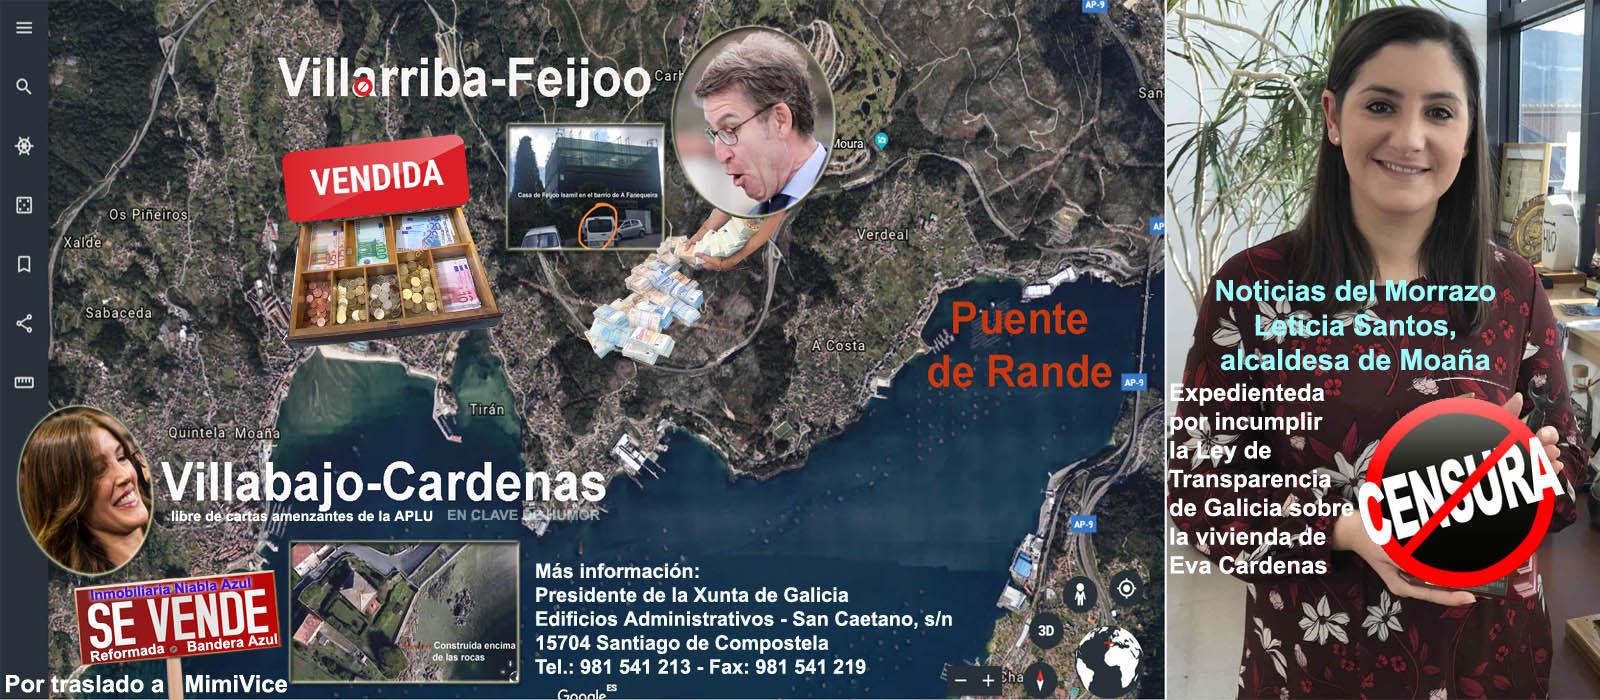 fotomontajeportada alcaldesamoana leticia santos feijoo evacardenas aplu censura negocio